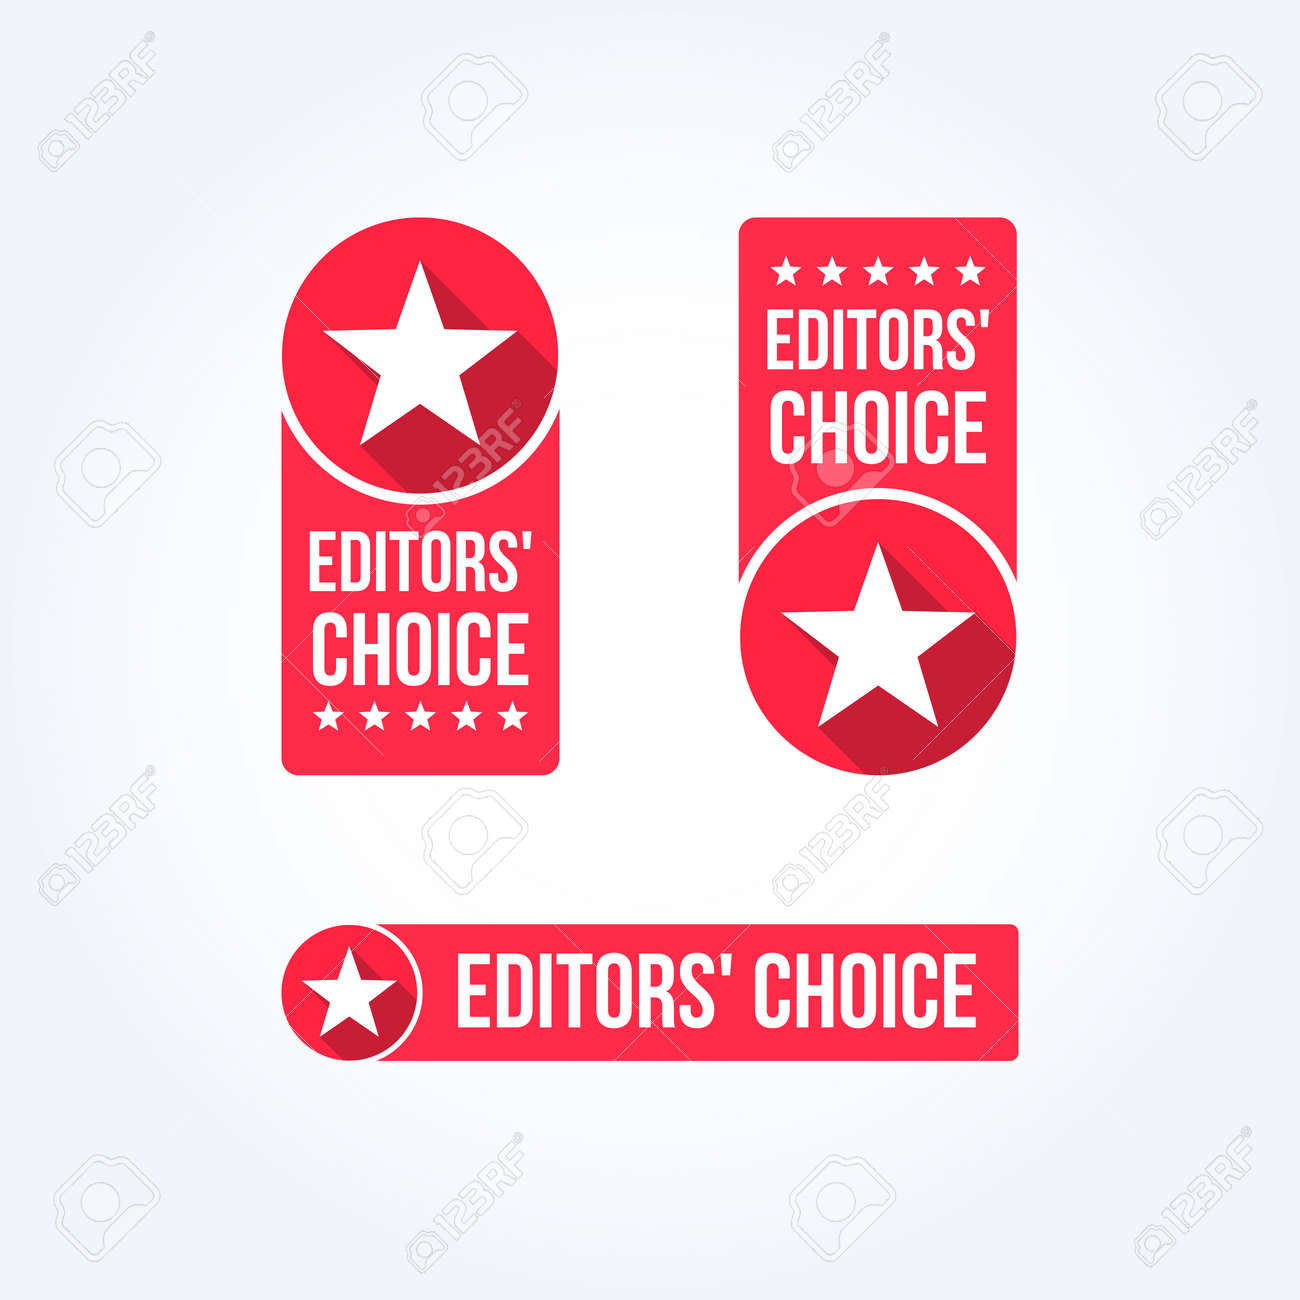 Editors' Choice Labels - 55387466